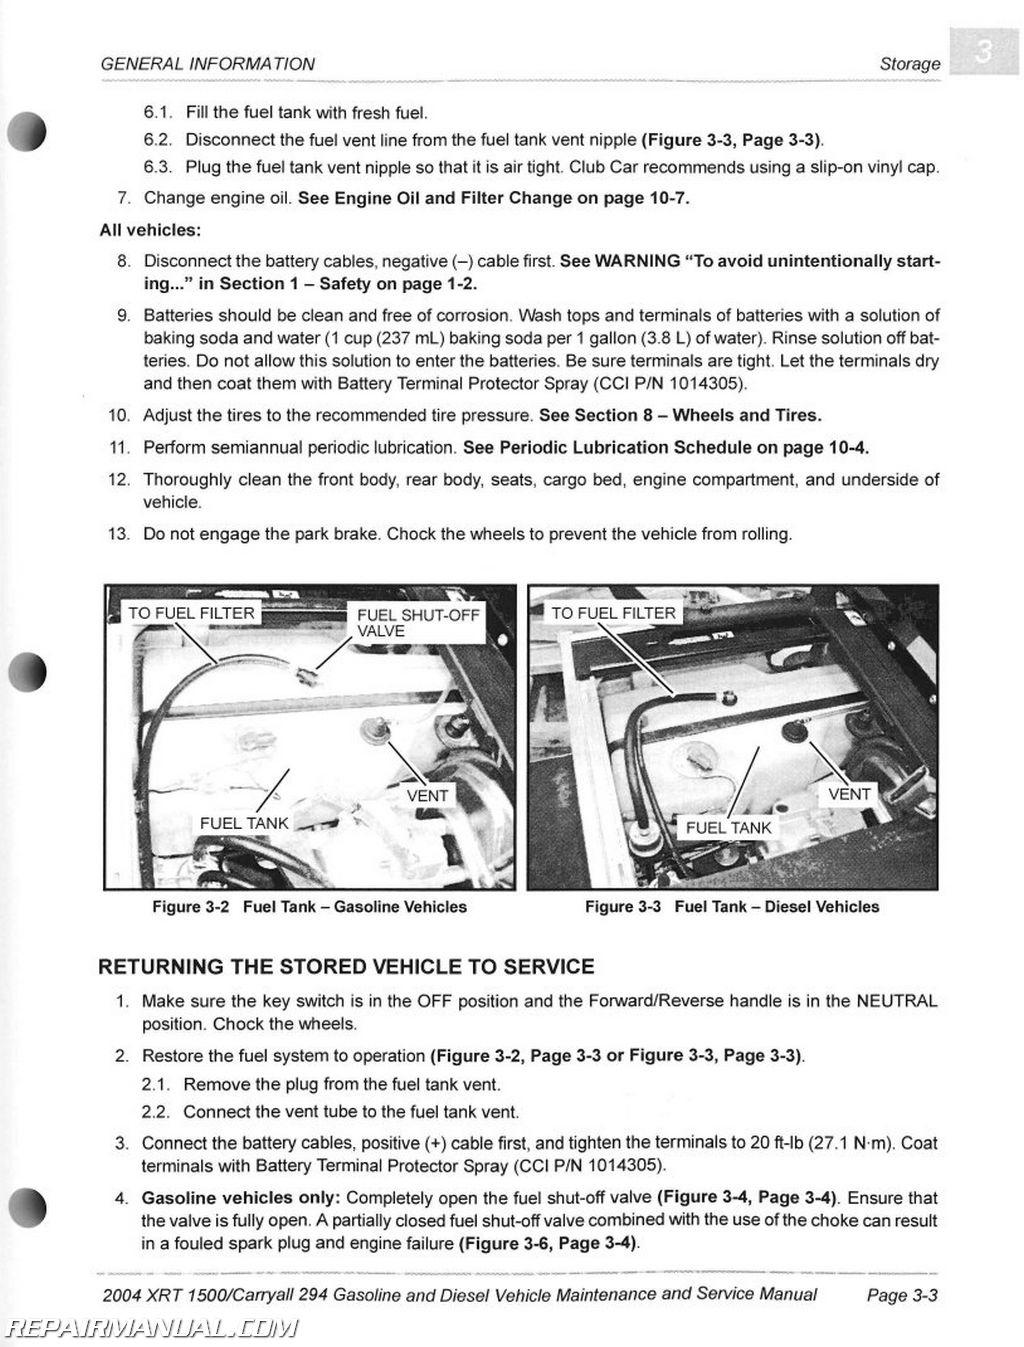 Club Car Fuel Filter Diagram - Wiring Diagram Data - Club Car Ds Wiring Diagram